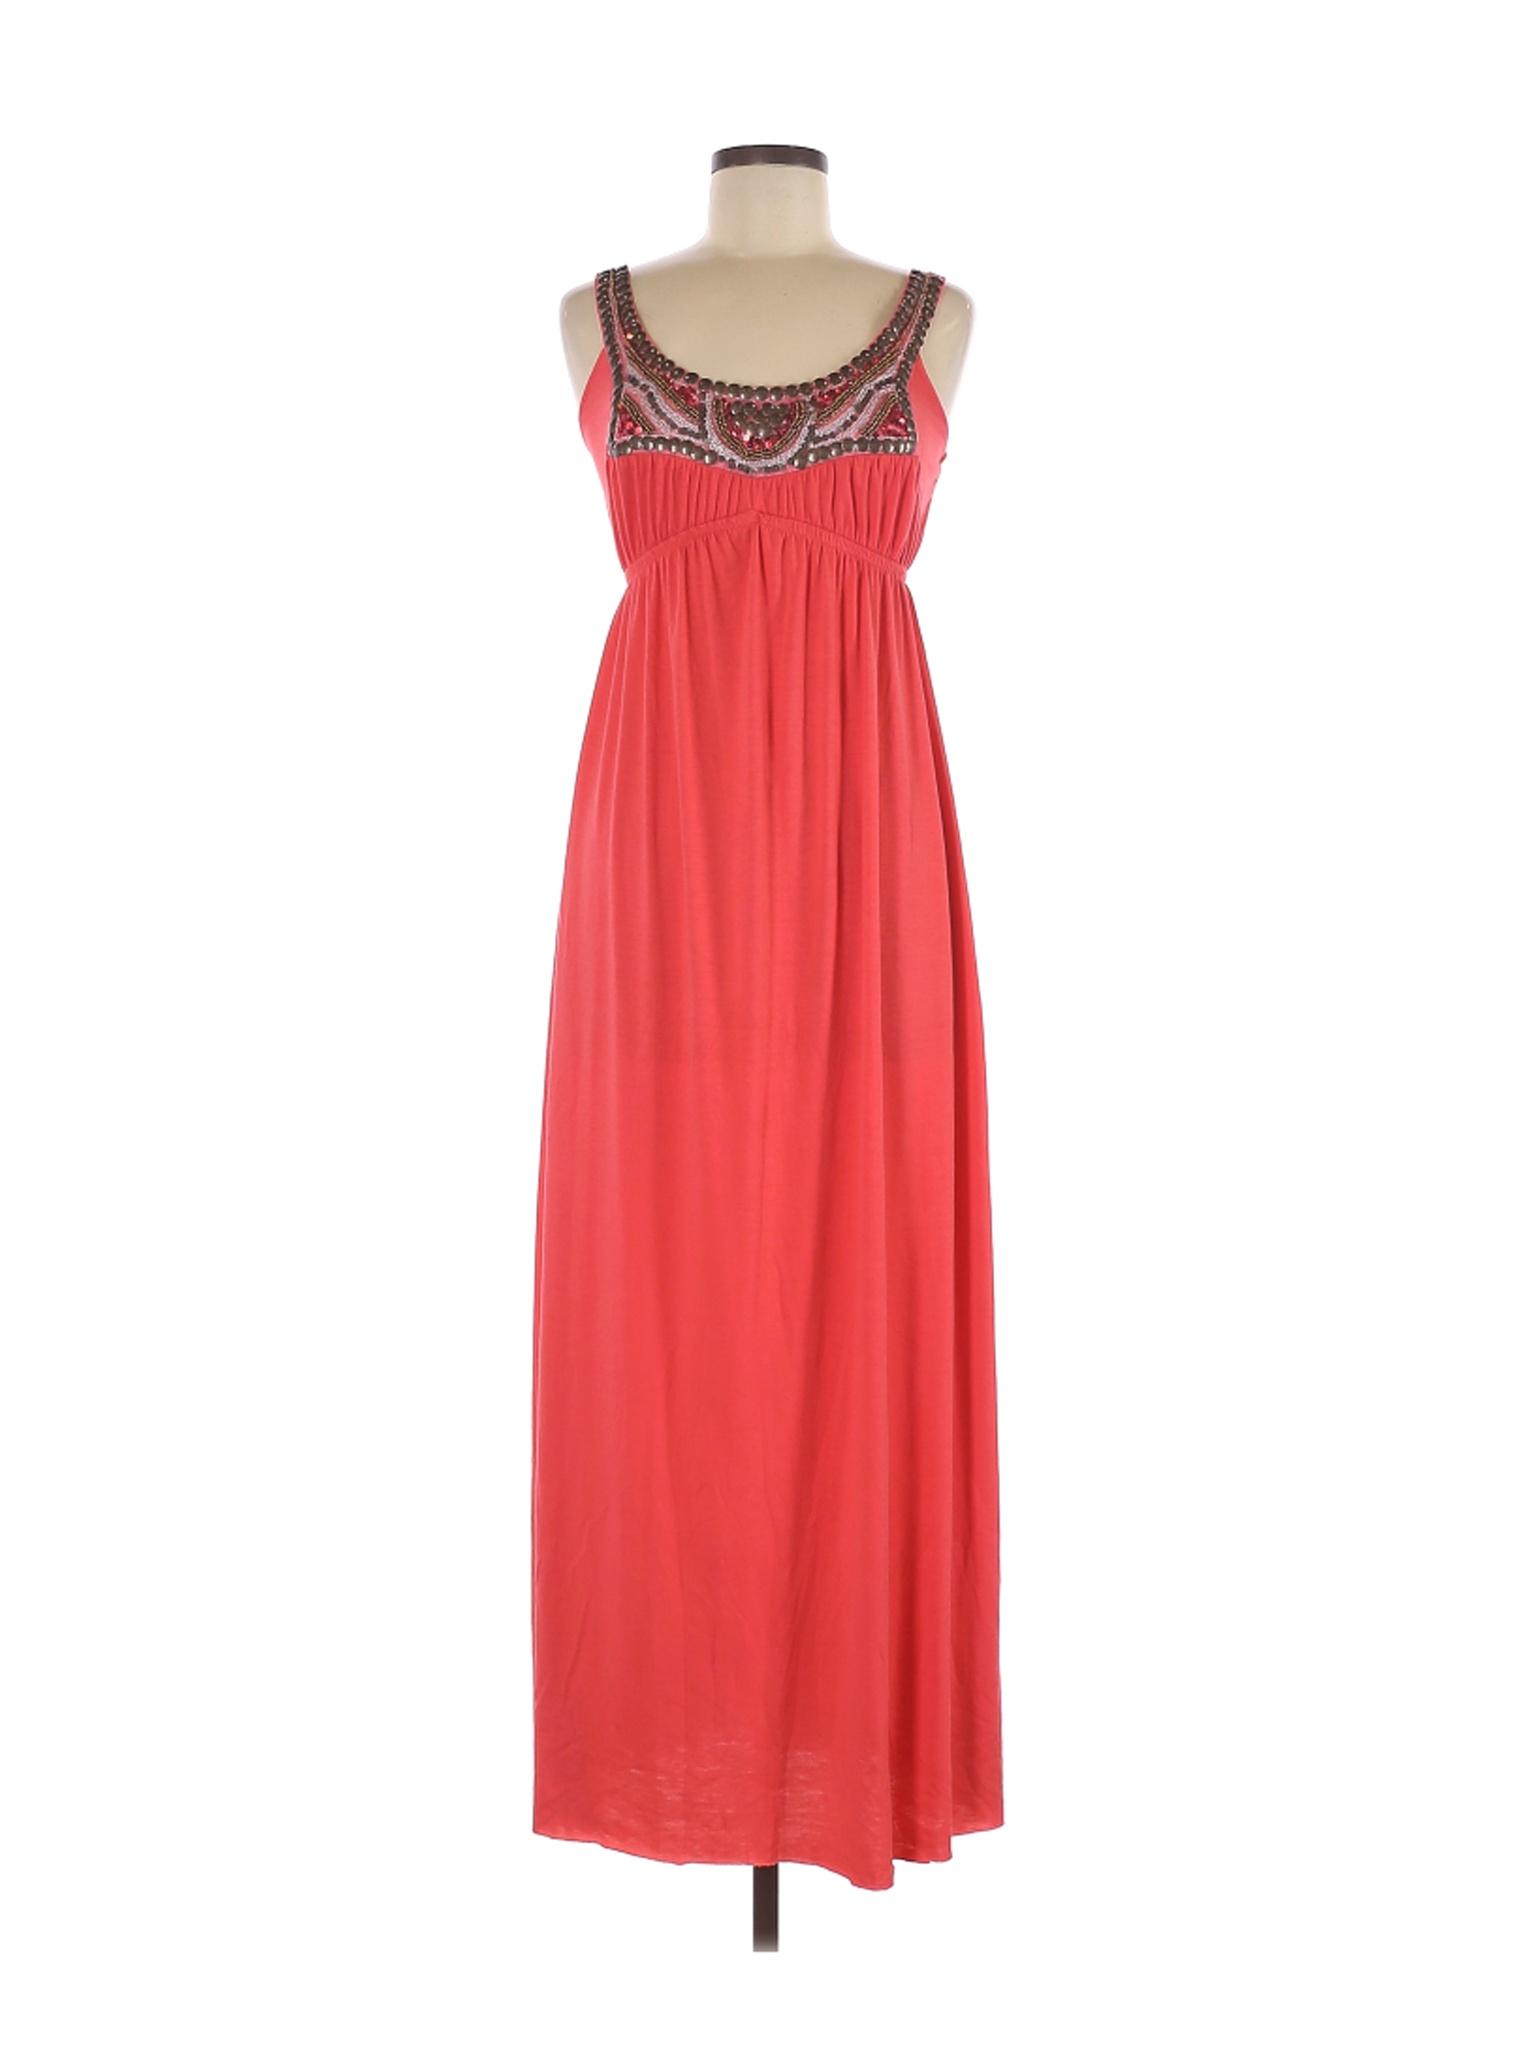 NWT Plus 2X 3X 4X 18 20 22 NEW Boho Caftan Evening Hippie Gothic Maxi Long Dress